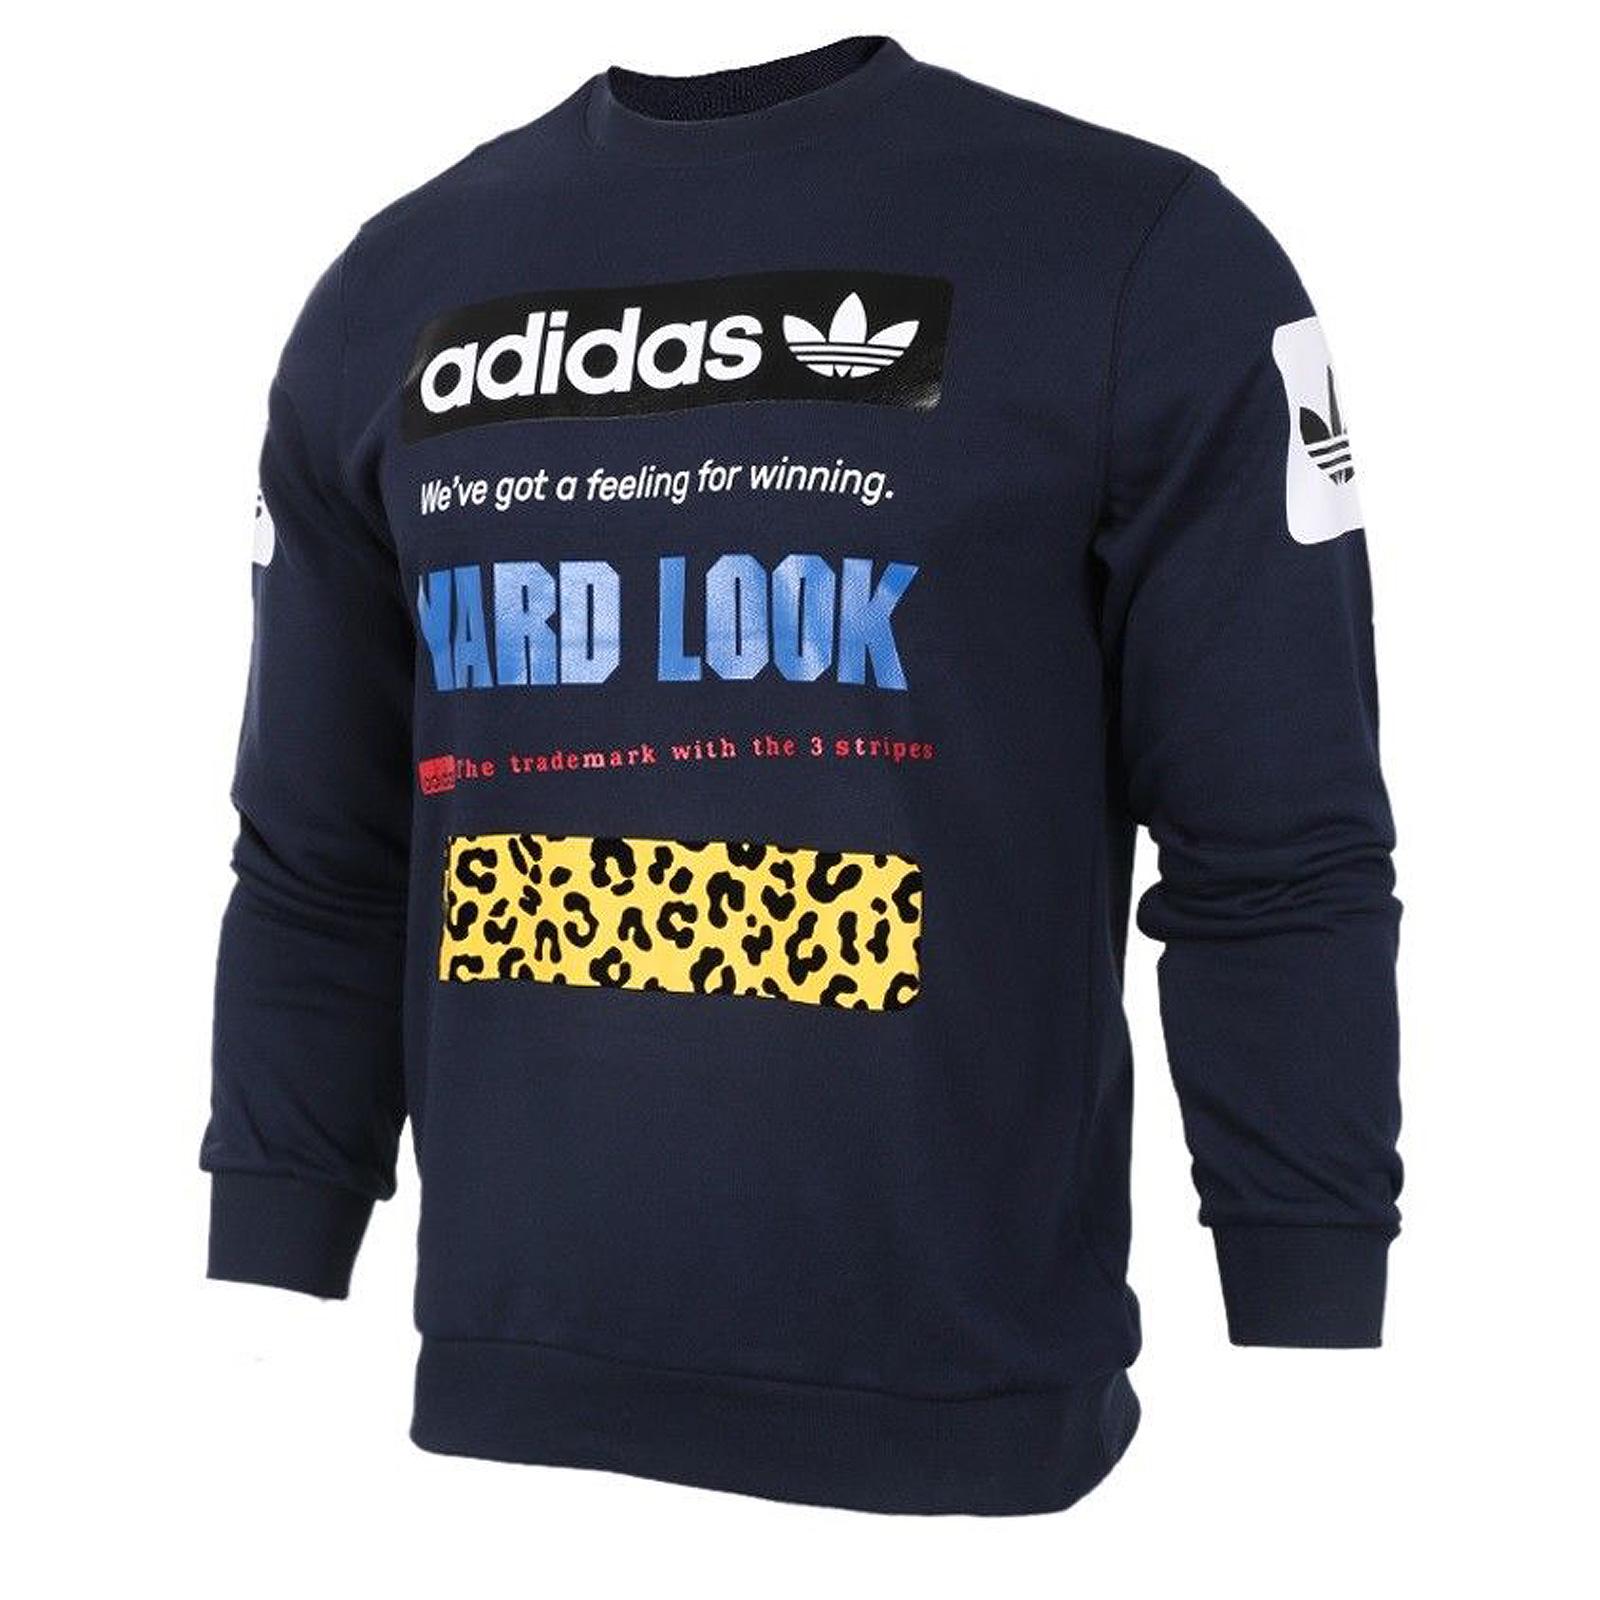 Dettagli su Adidas Originals Strada Grafico Crew Felpa Uomo CF5391 Trefoil Leo Blu